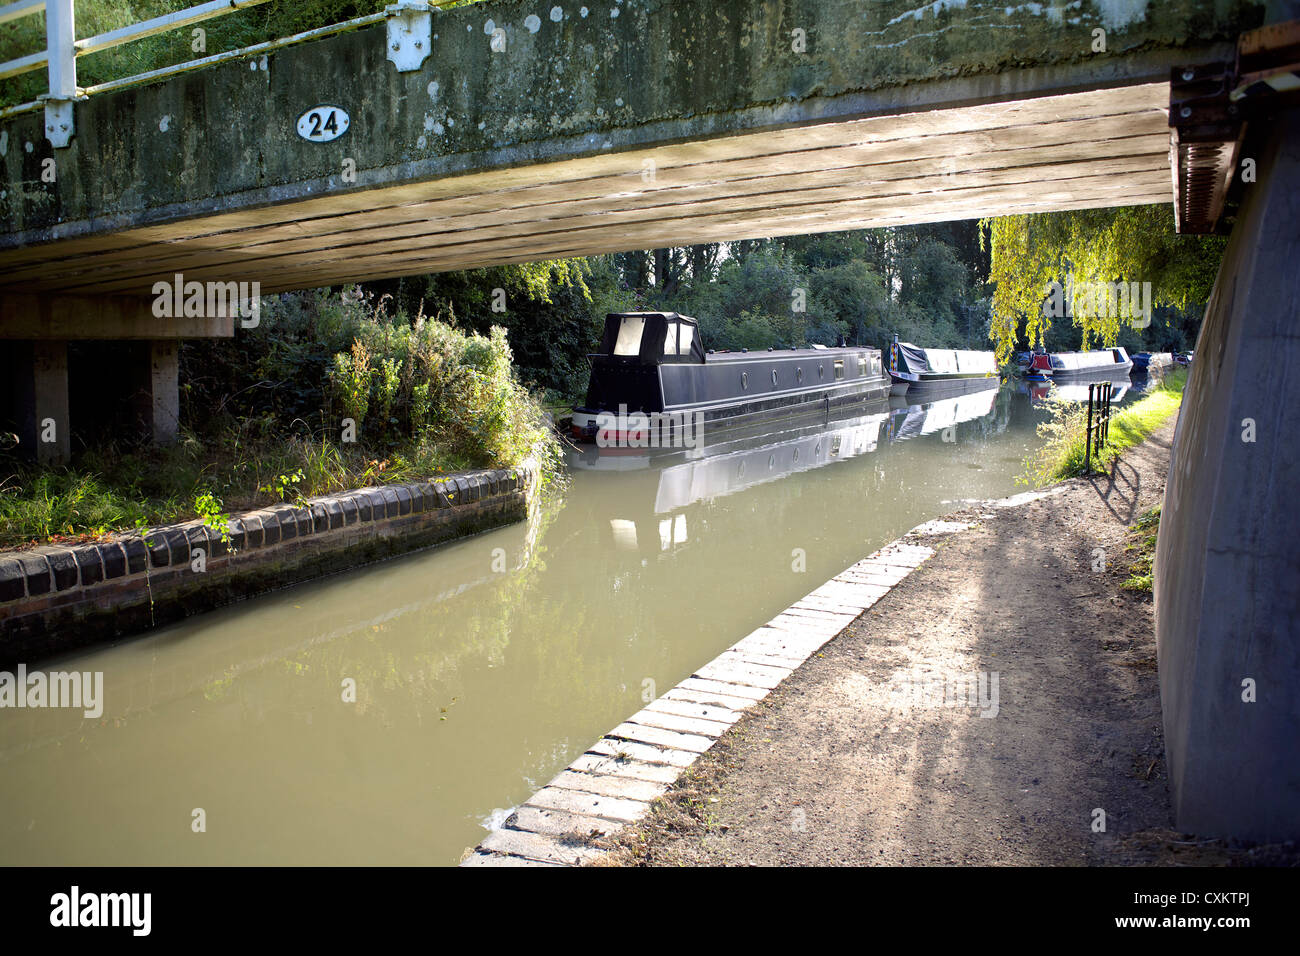 Bridge 24 Grand Union Canal Warwickshire UK England GB British English inland waterways canals countryside English - Stock Image